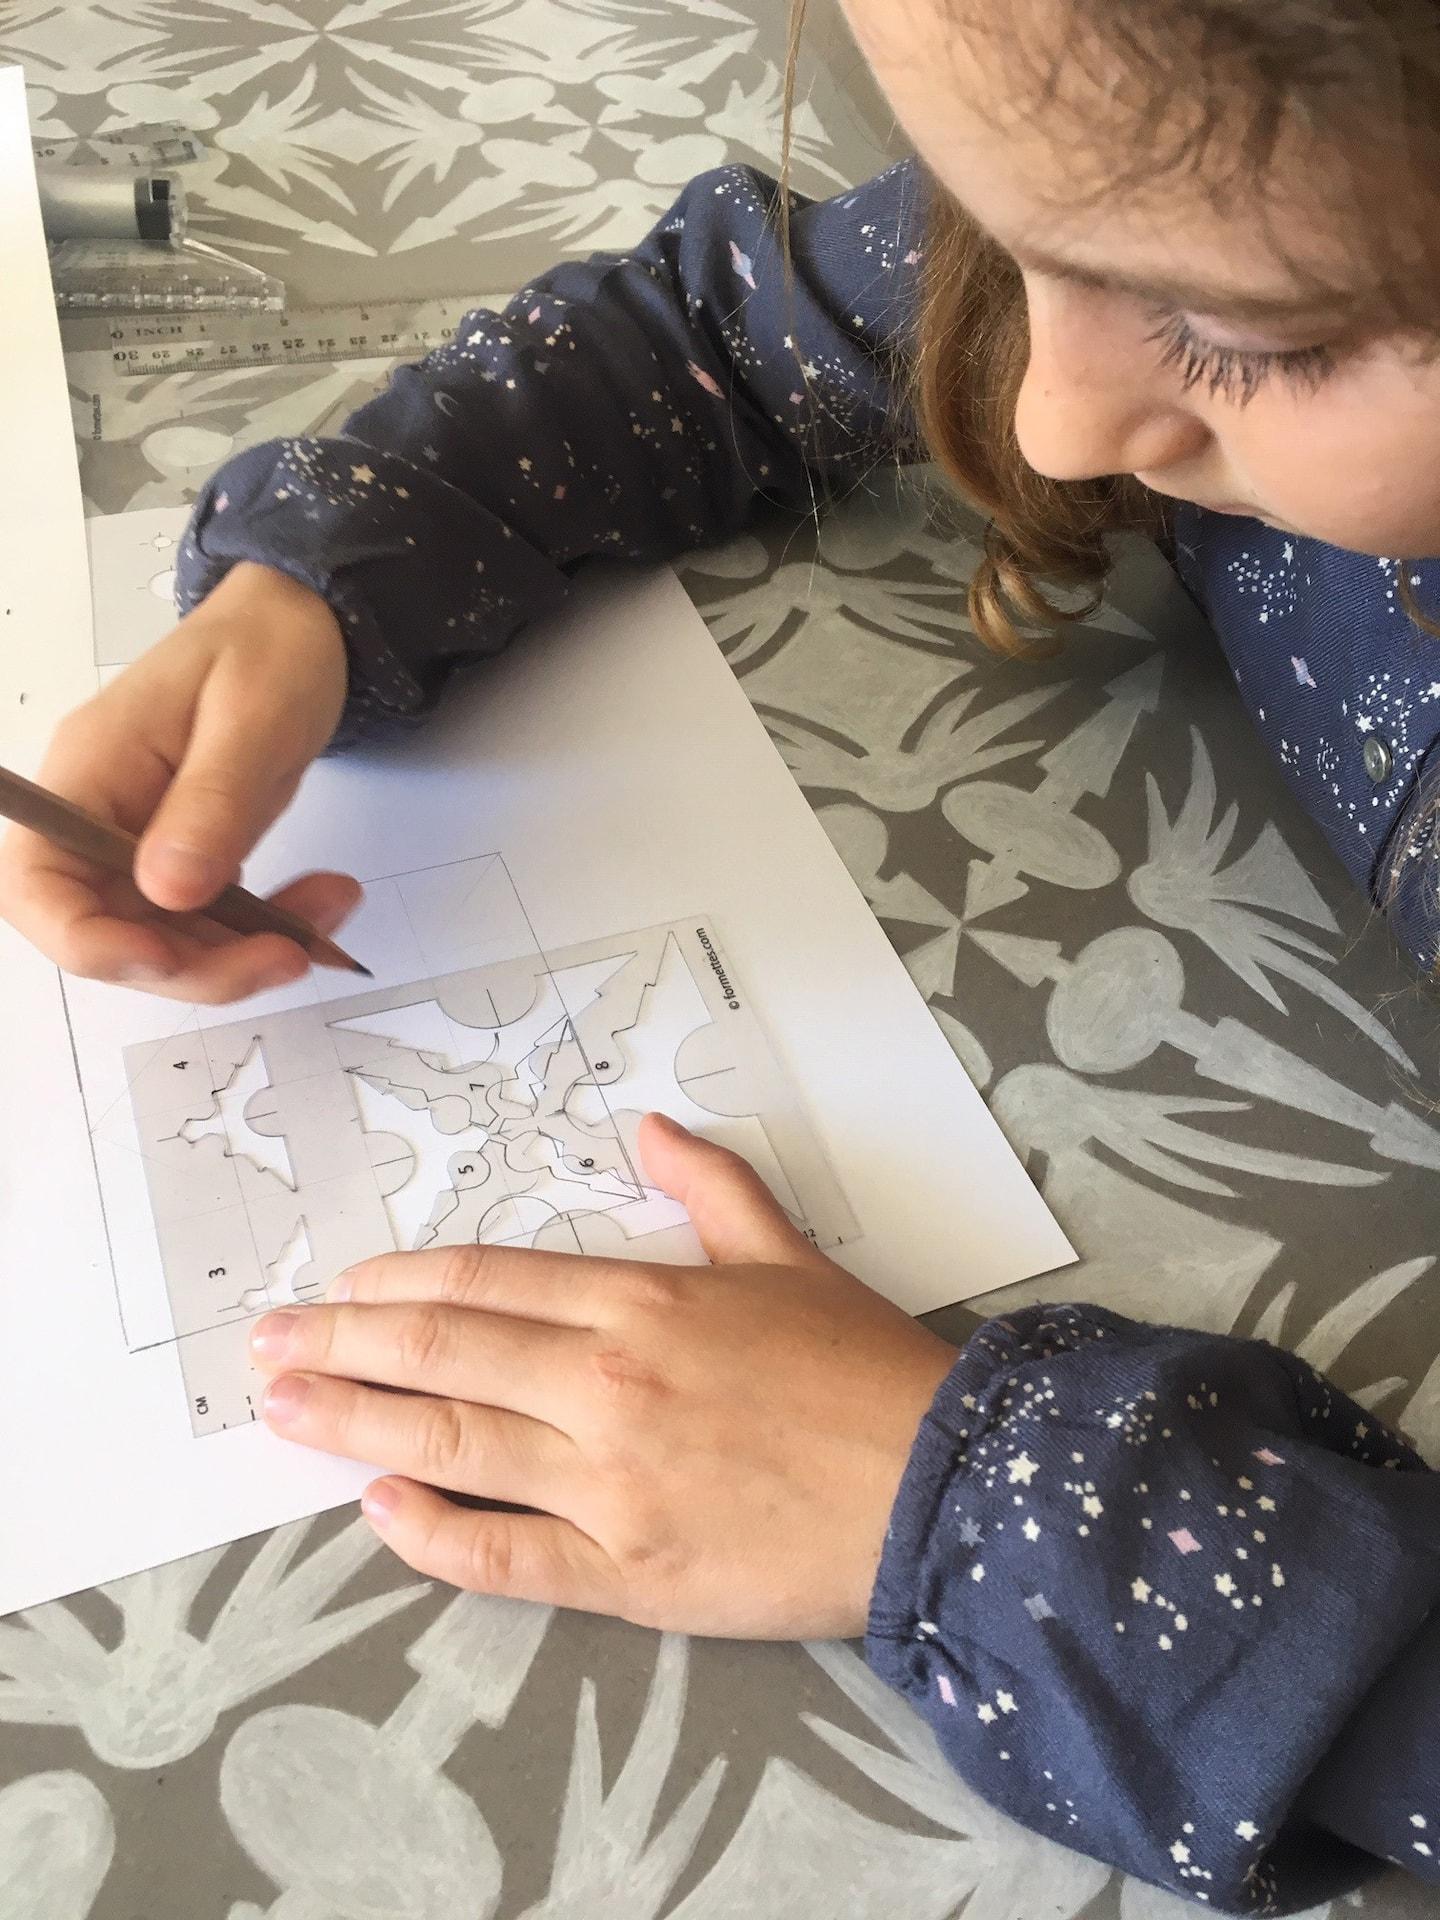 atelier azulejos Airbnb expérience workshop